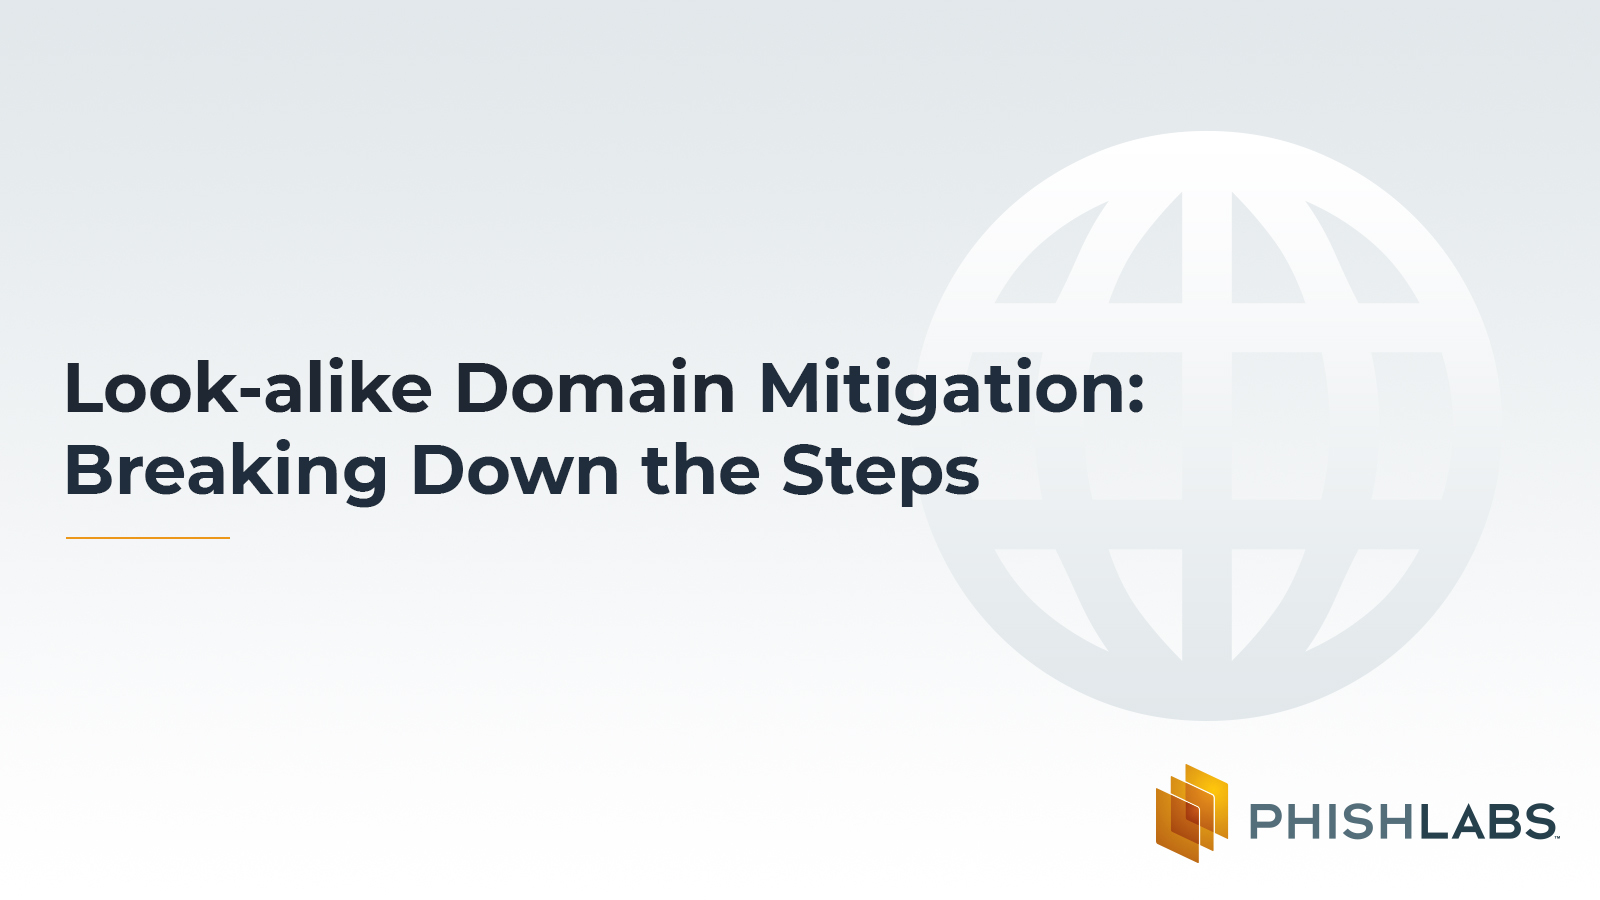 Look-alike Domain Mitigation- Breaking Down the Steps